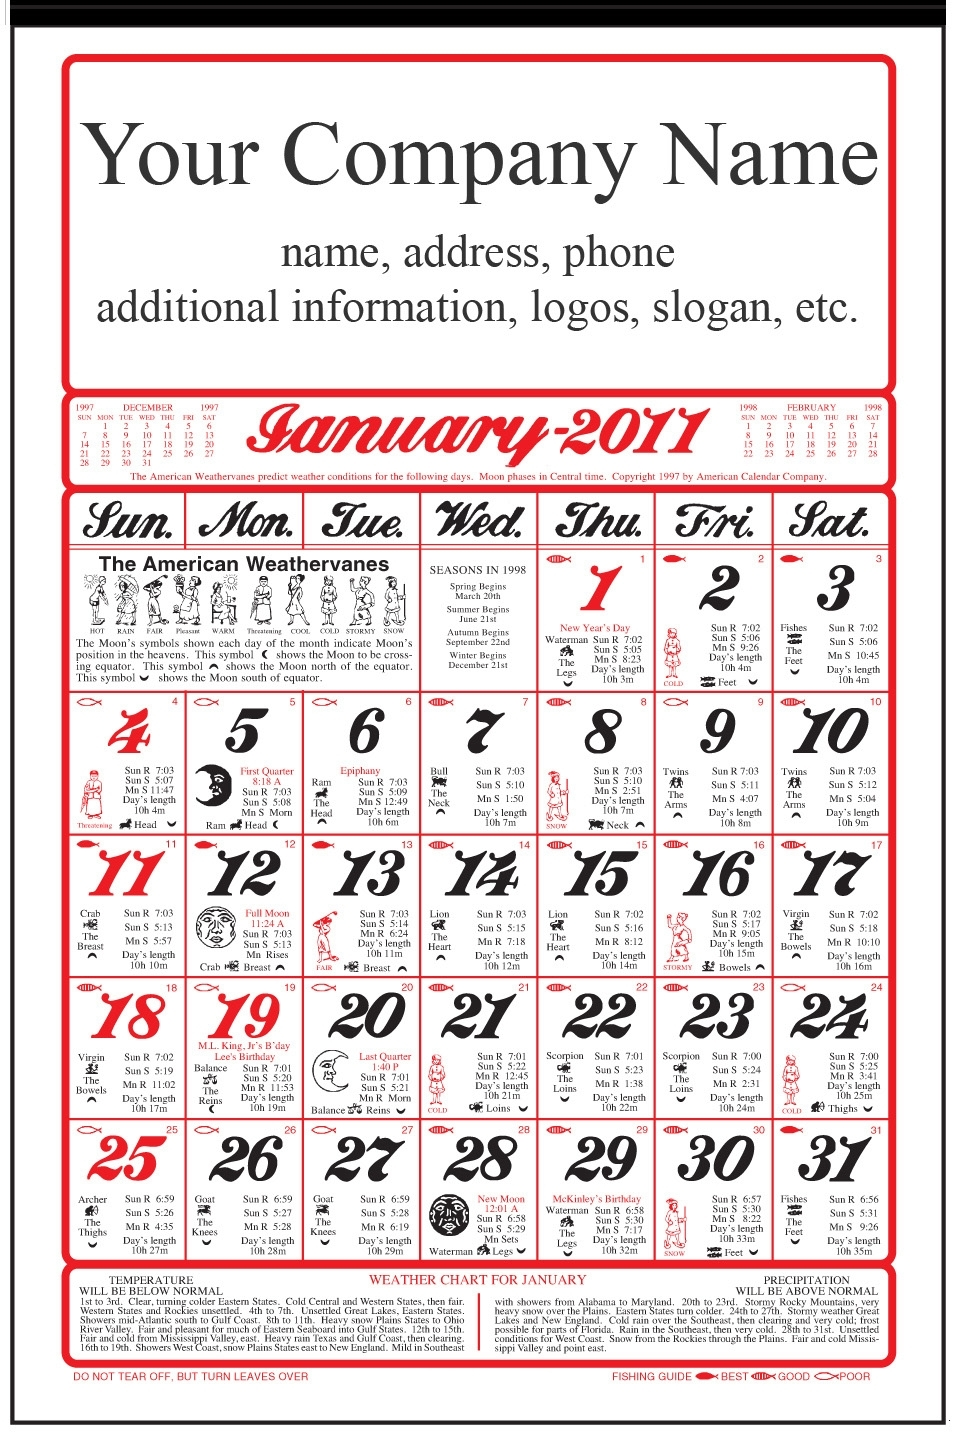 Original Almanac Calendar Old Fashioned(With Ad)Garden Farmers And Helpful  Hints